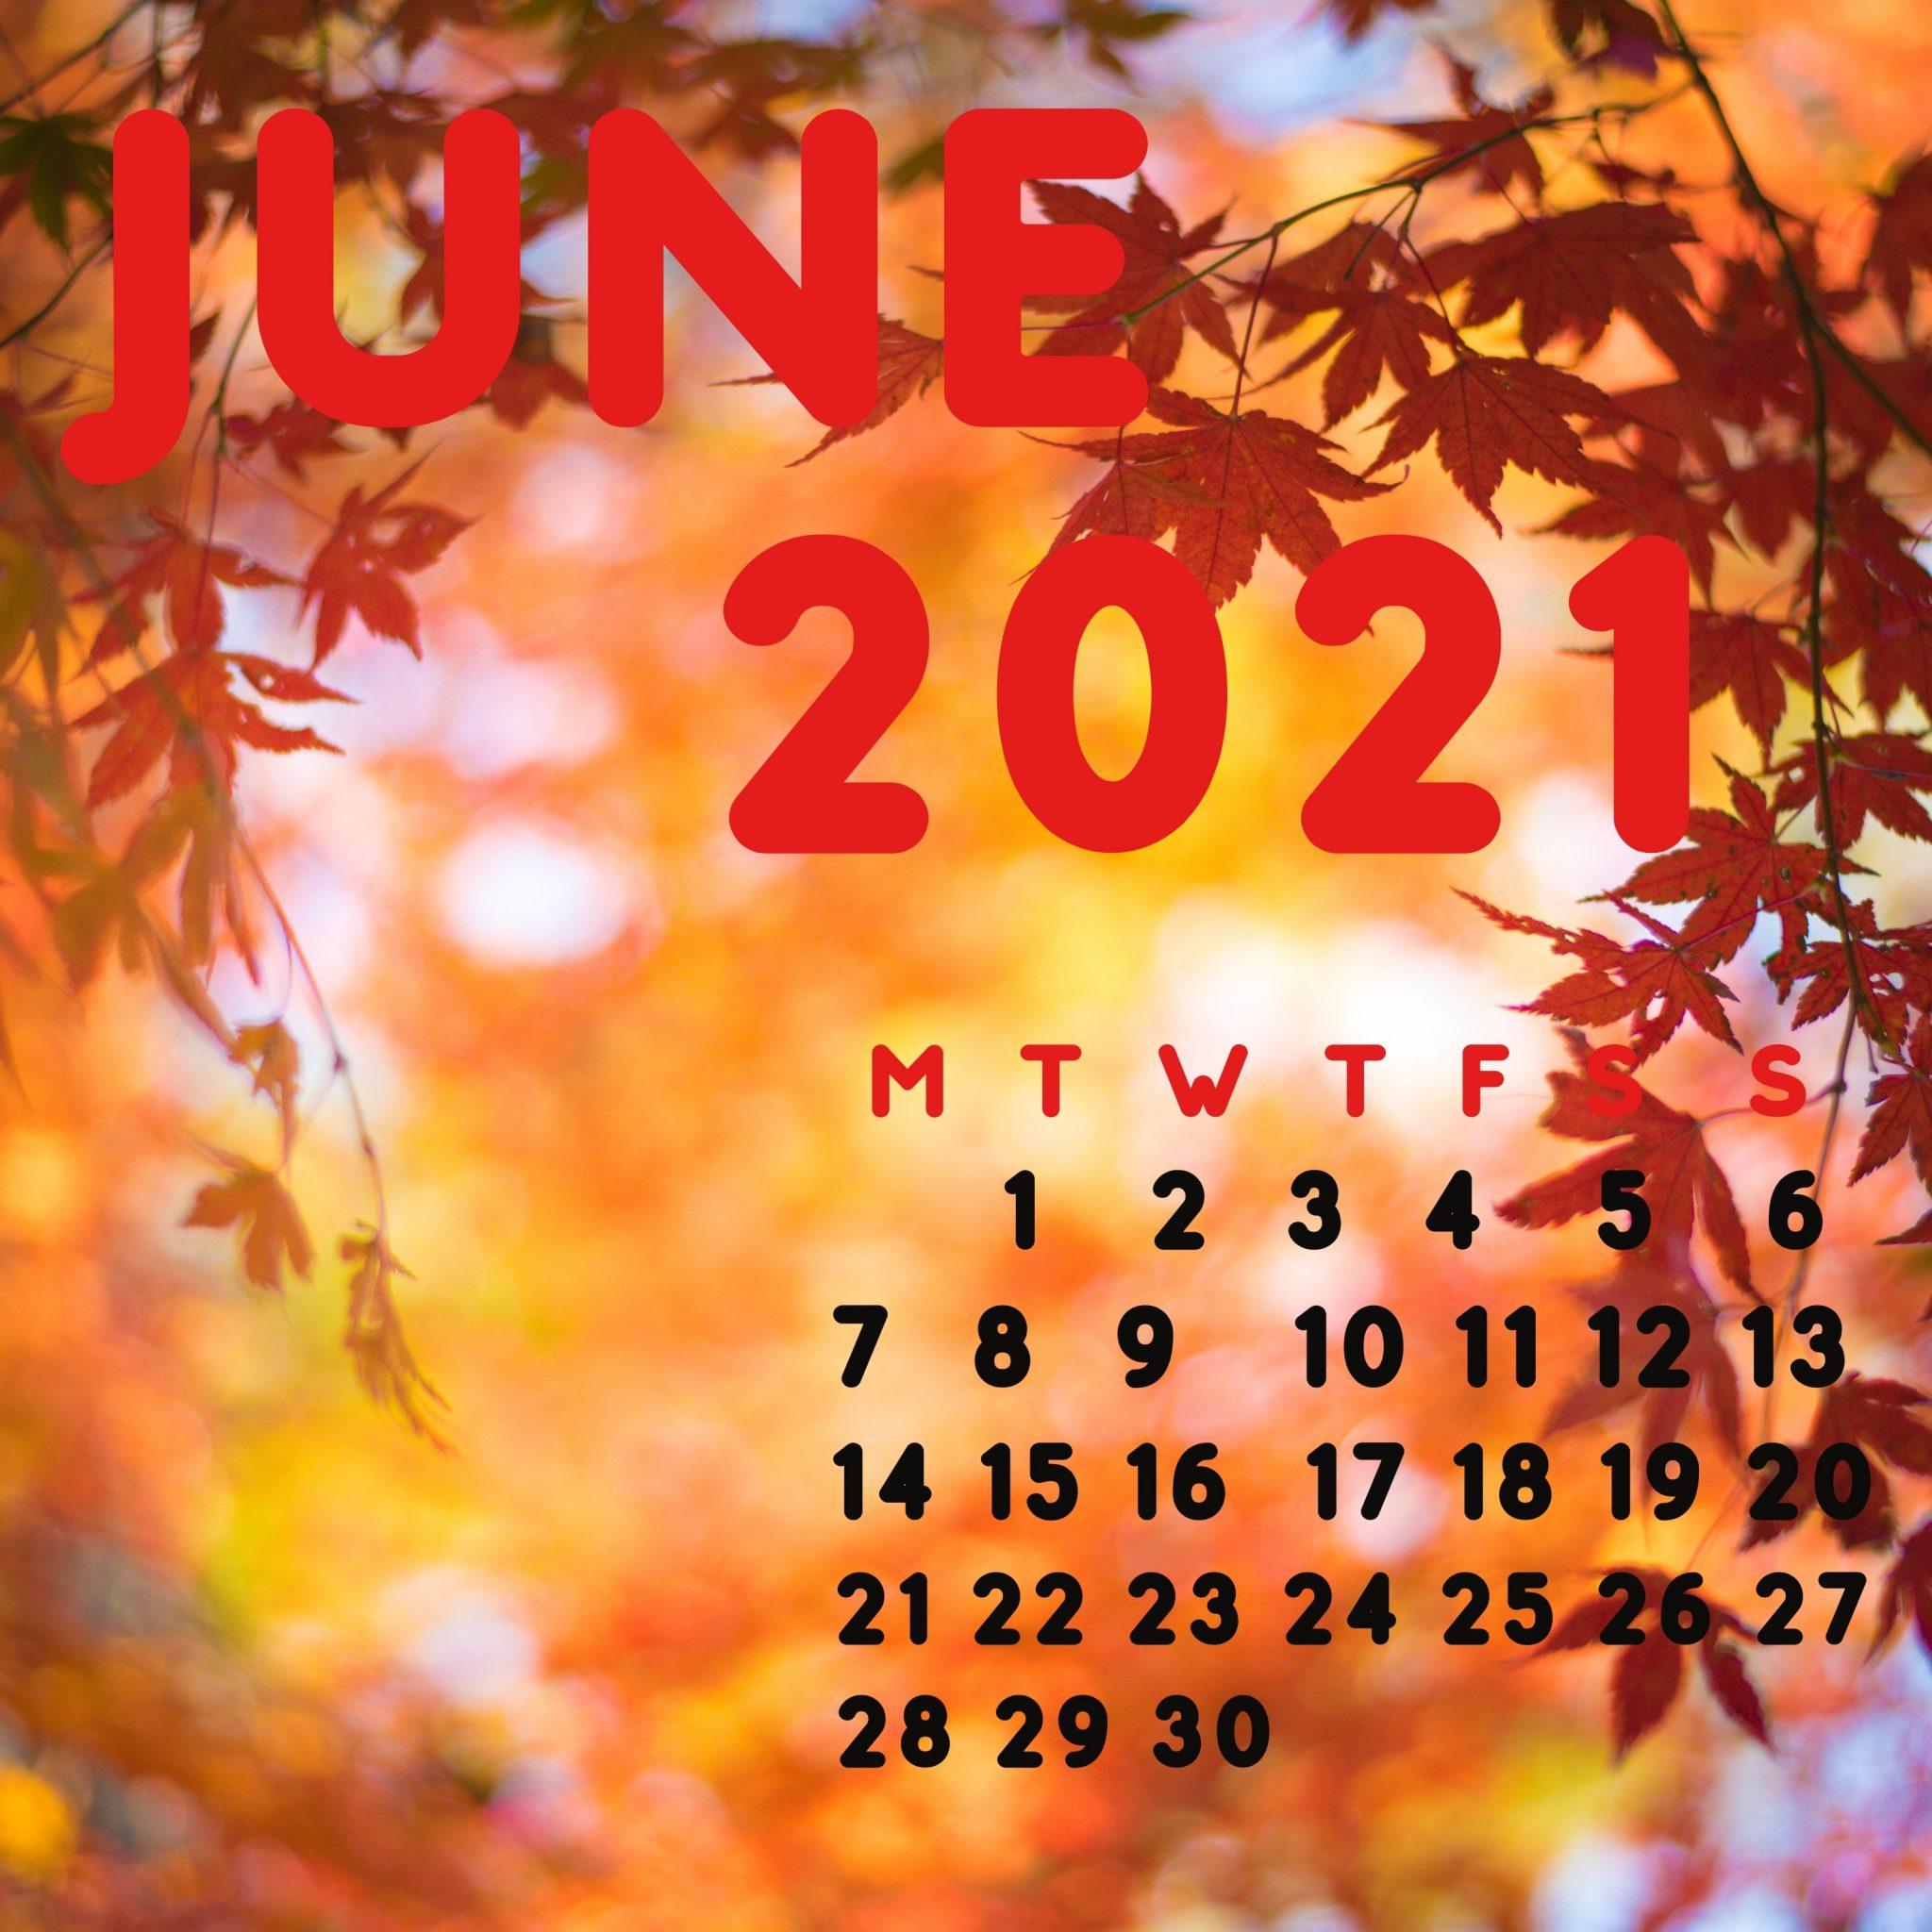 2048x2048 wallpapers iPad retina June 2021 iPad Wallpaper 2048x2048 pixels resolution